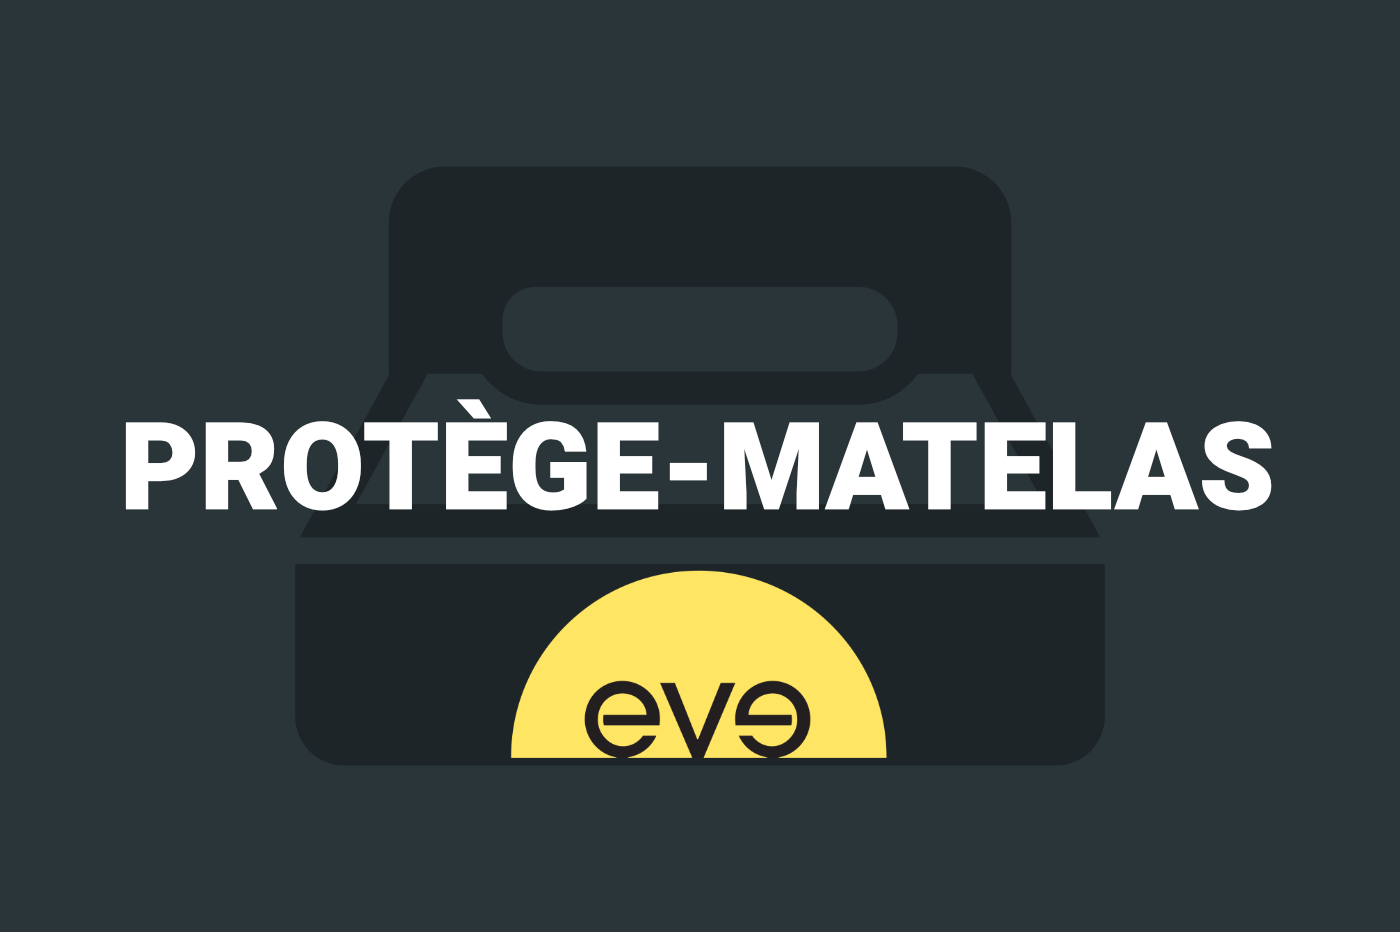 Protège-matelas Eve